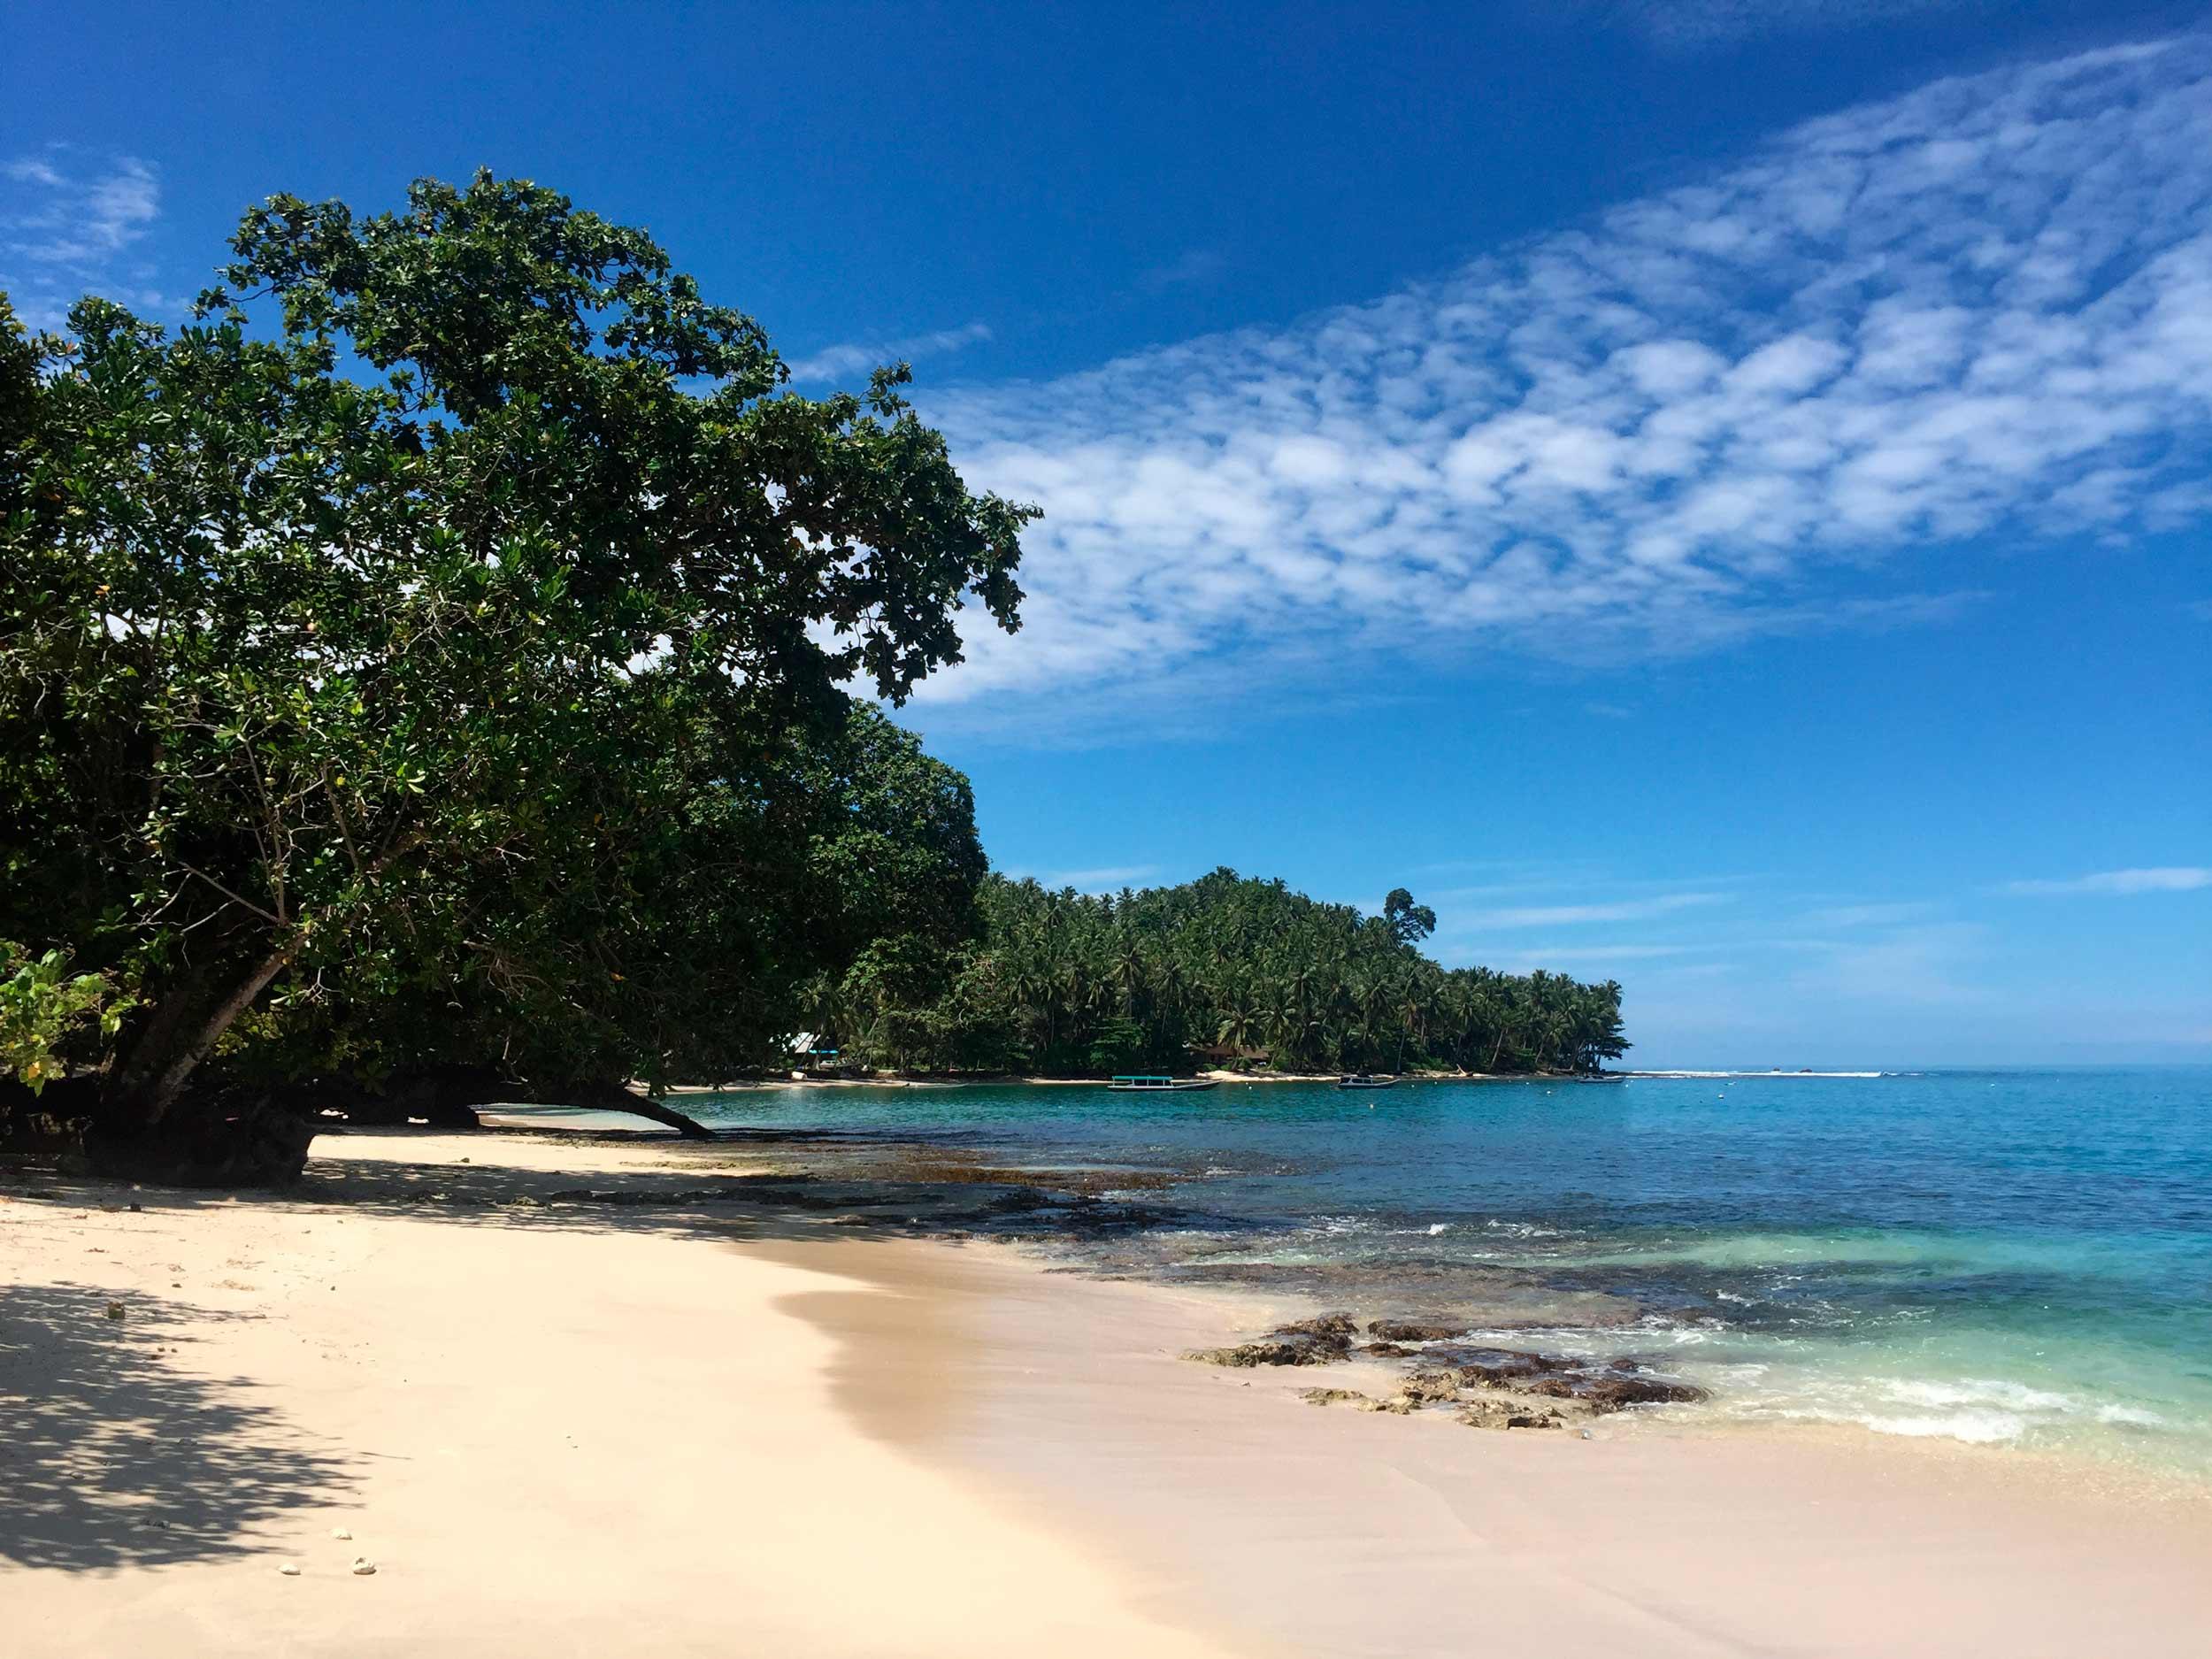 A trip to Mentawai Indonesia